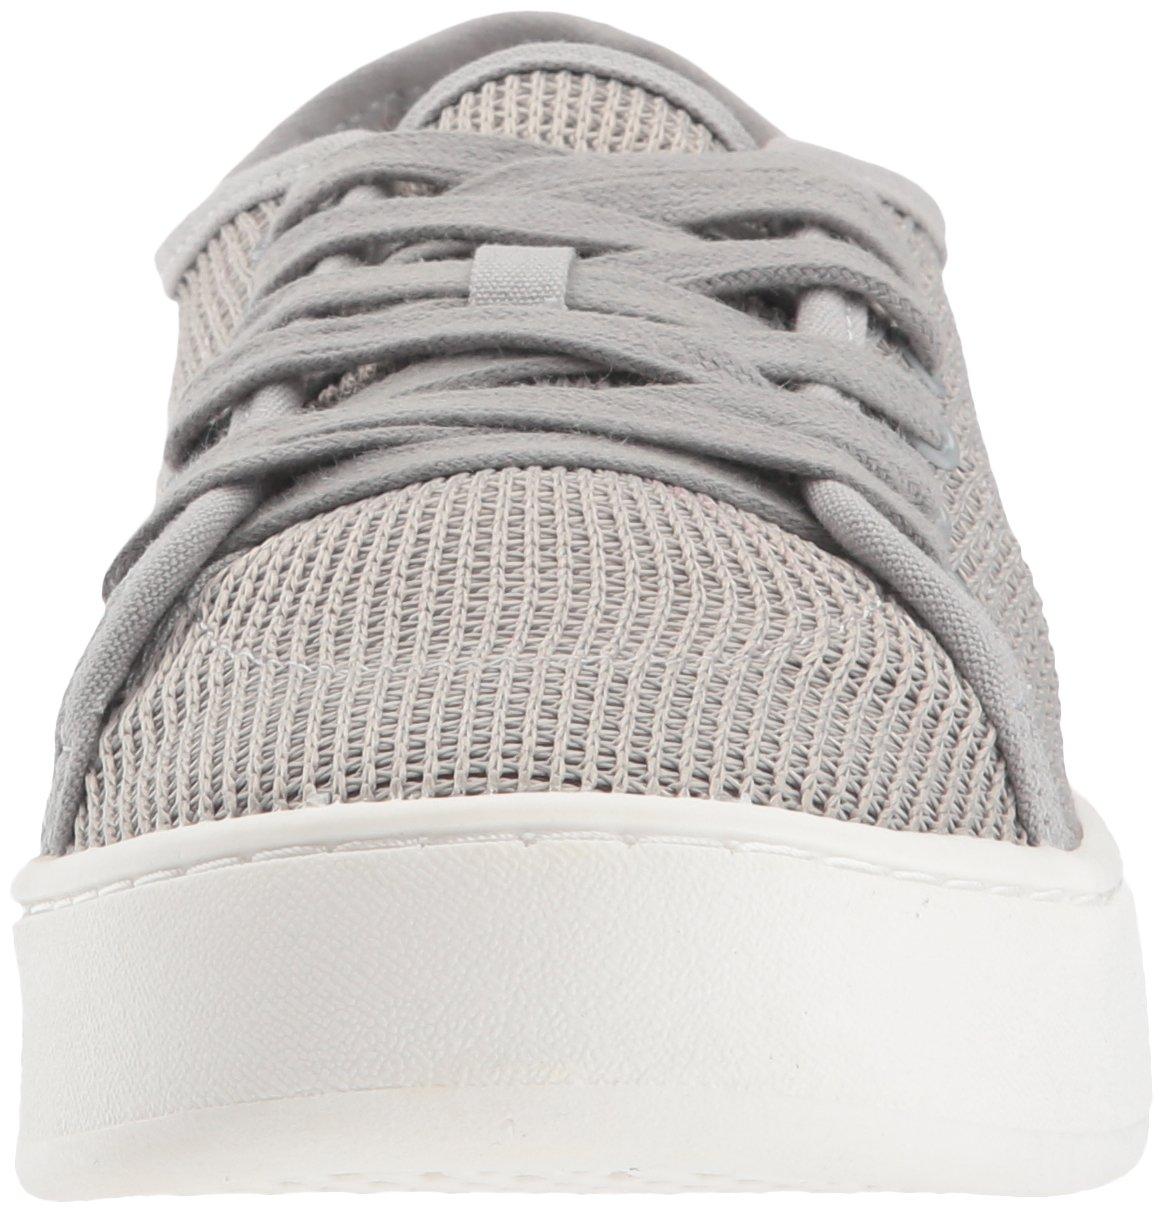 Donald Sneaker J Pliner Women's Cecile Sneaker Donald B0755CT1T5 5.5 B(M) US Silver db8b93